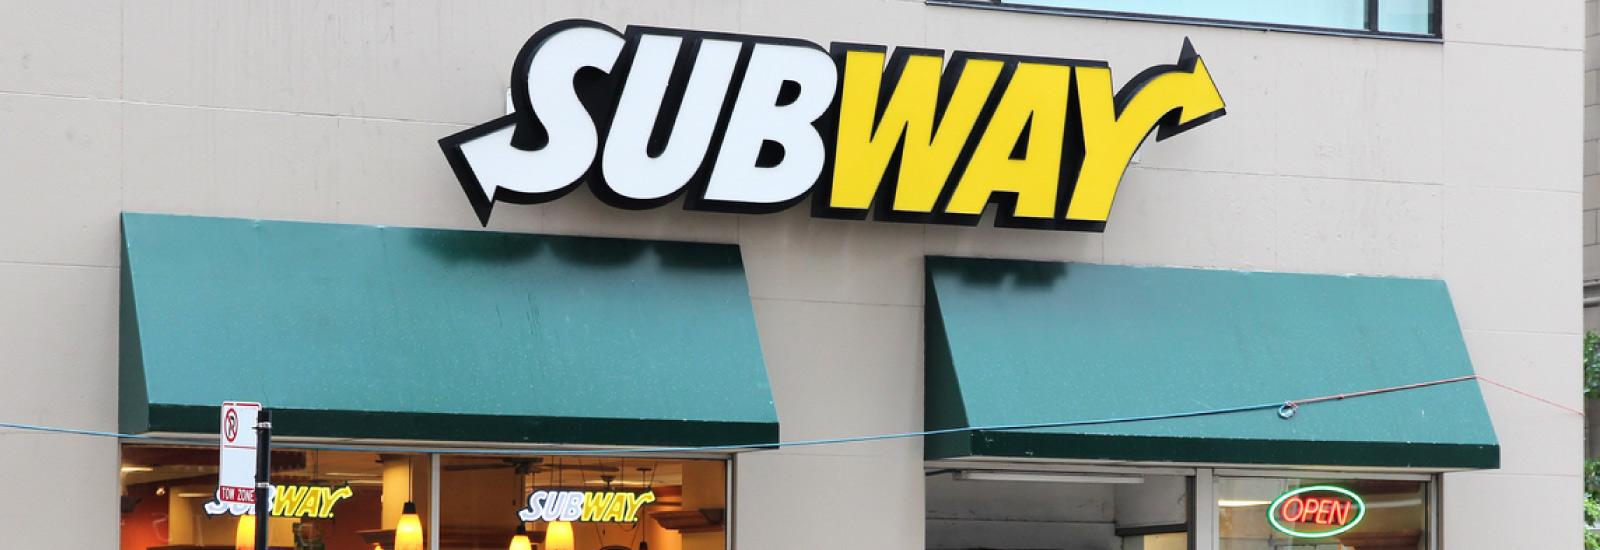 Subway, NAS Lemoore, CA